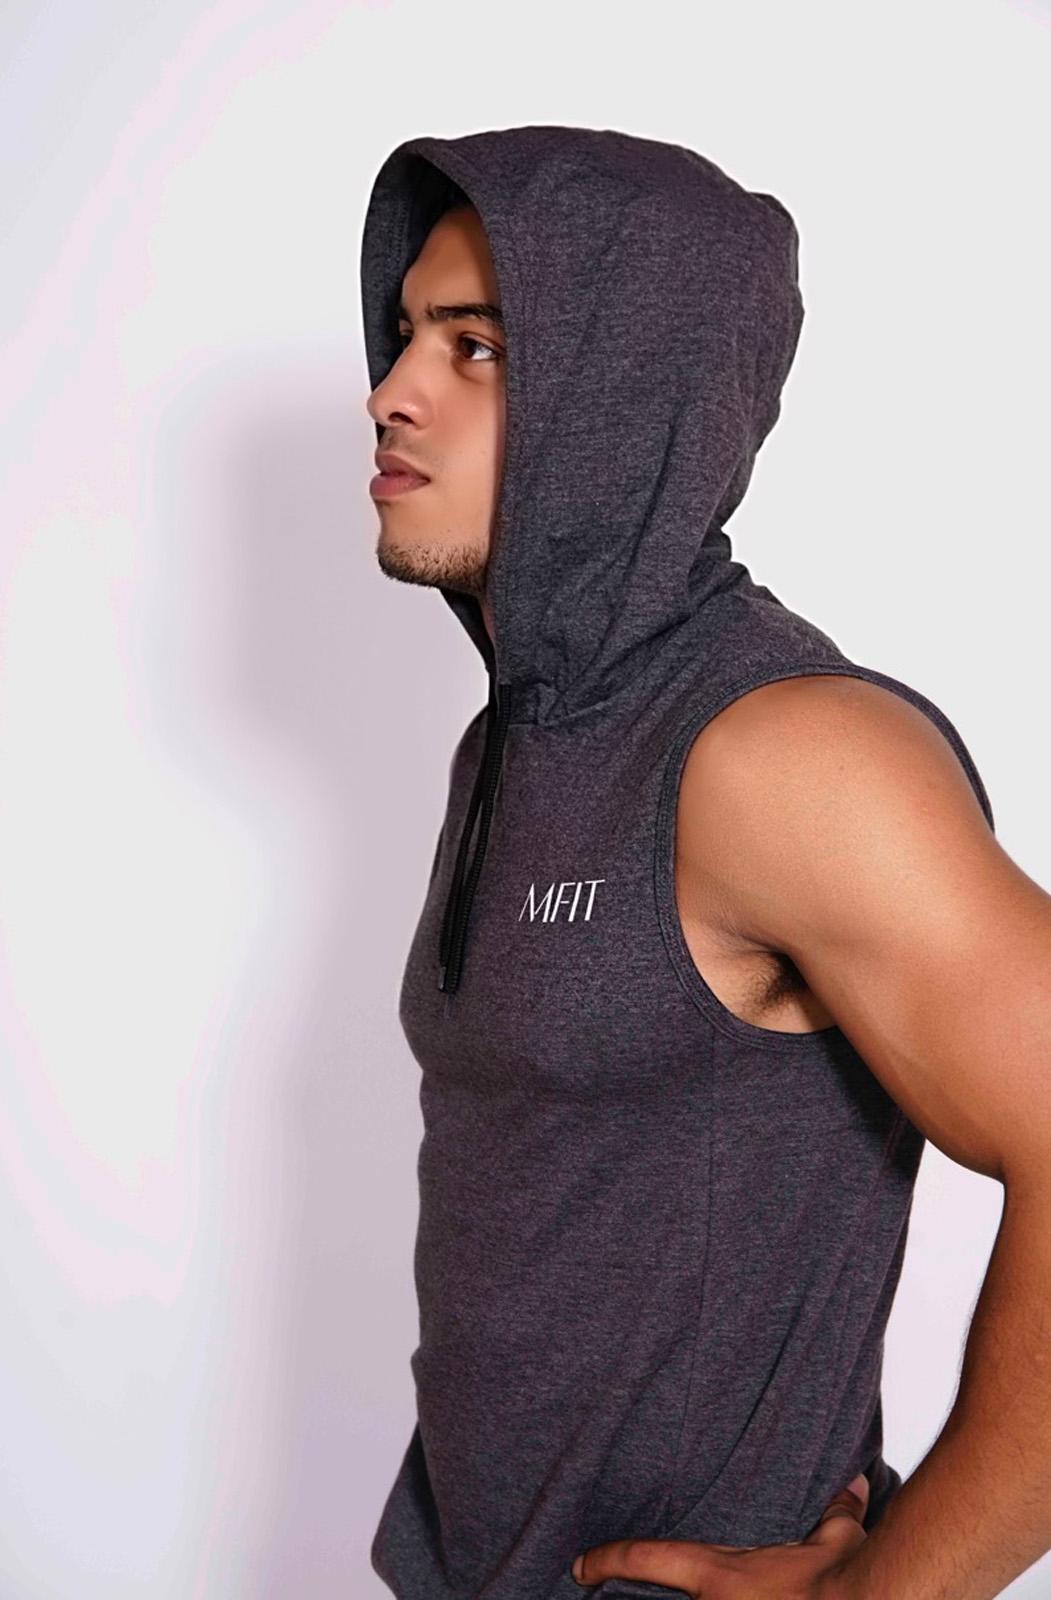 Sport sleeveless hoodie Heren Grijs - Mfit-2